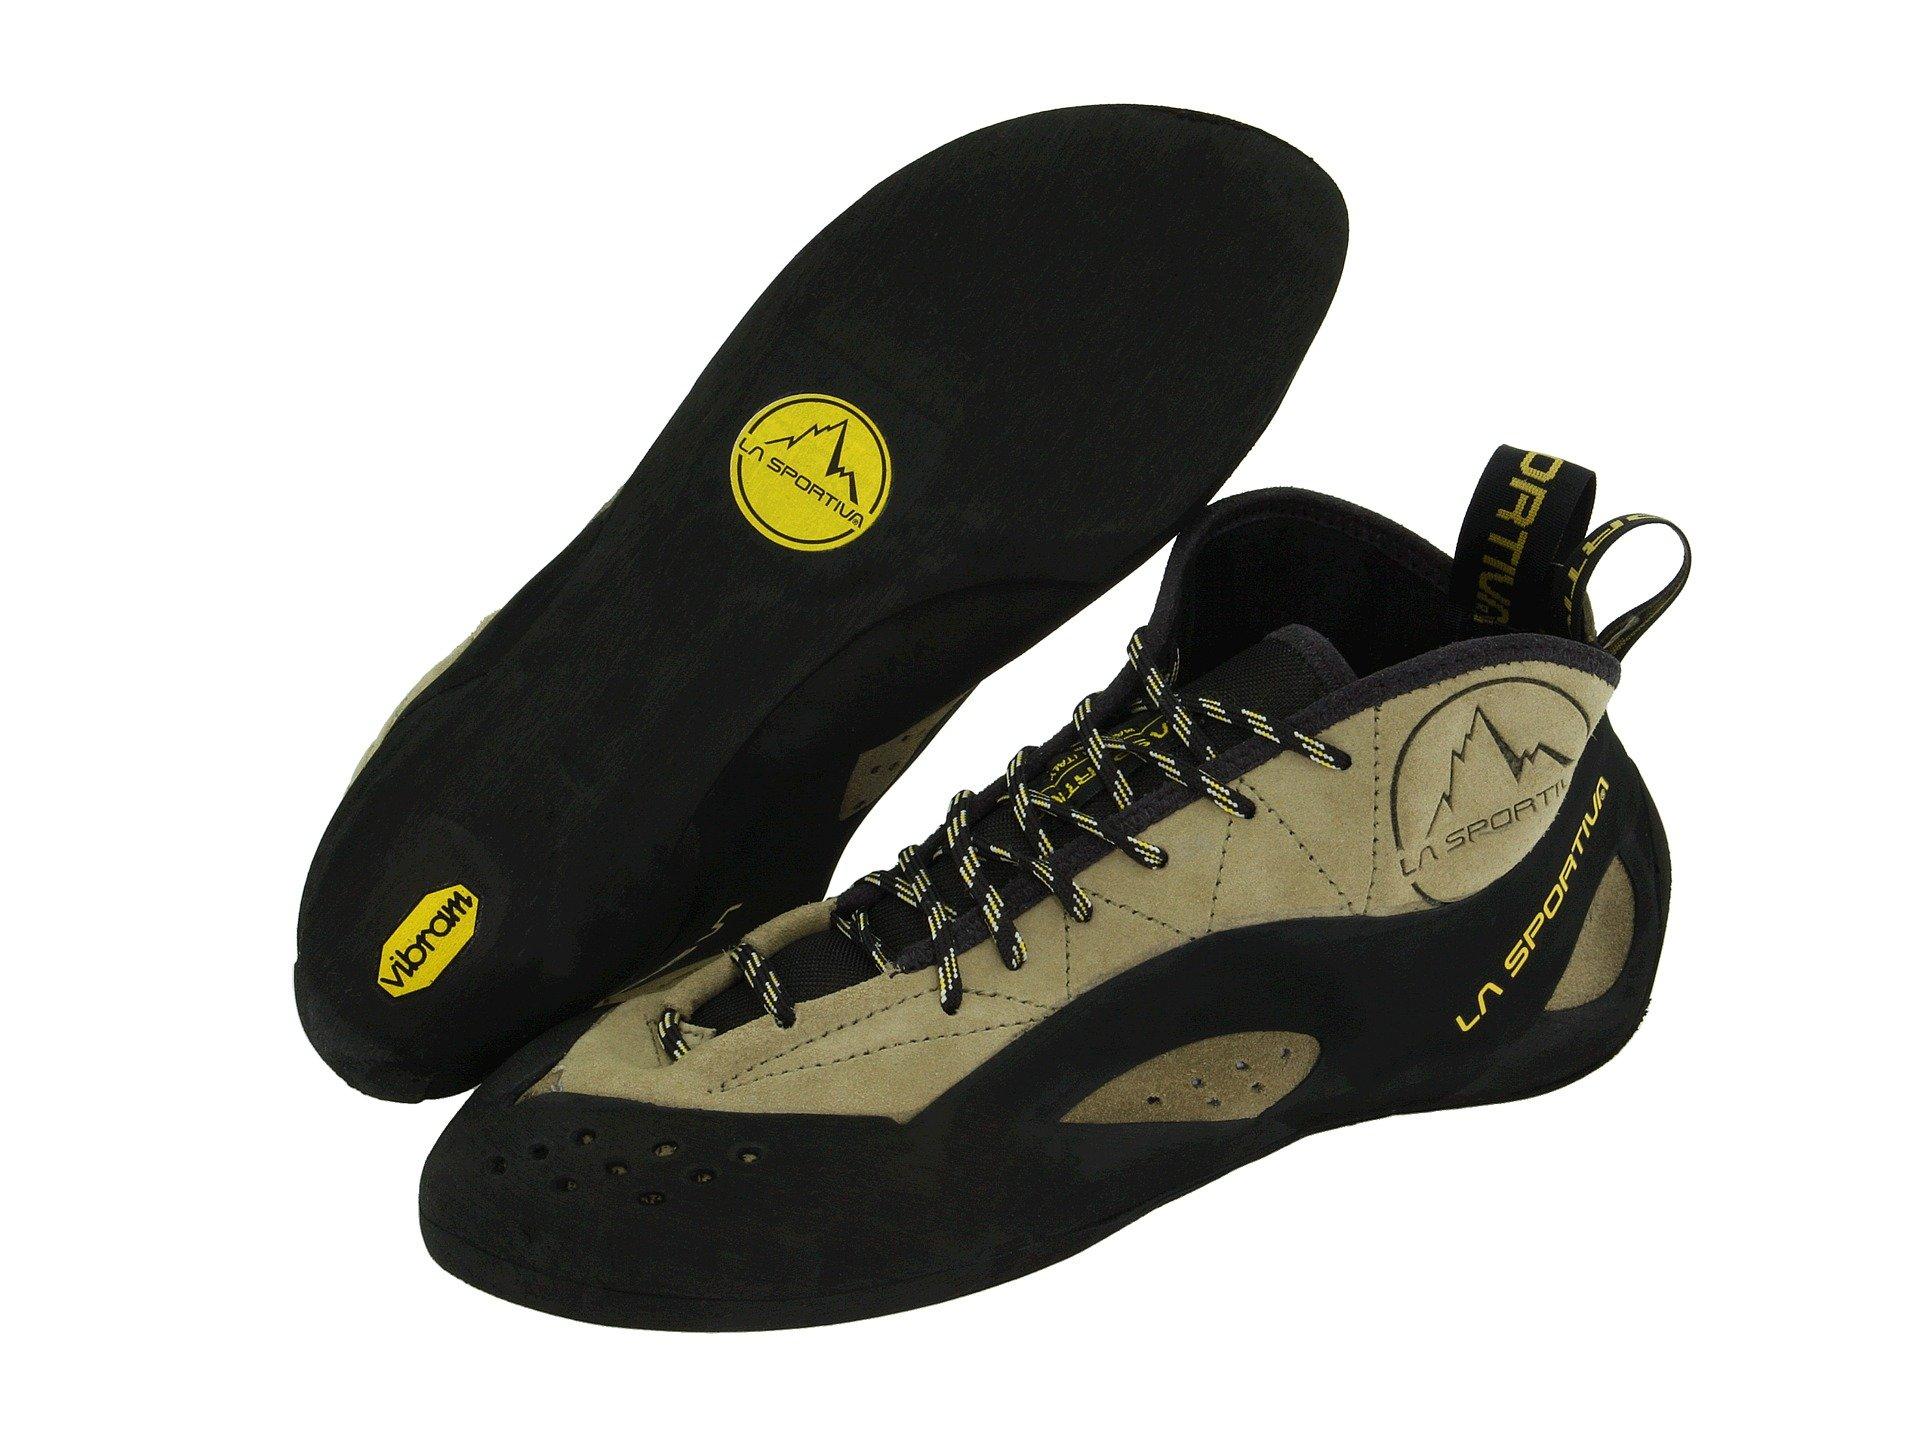 795369aad02b27 Men s La Sportiva Shoes + FREE SHIPPING